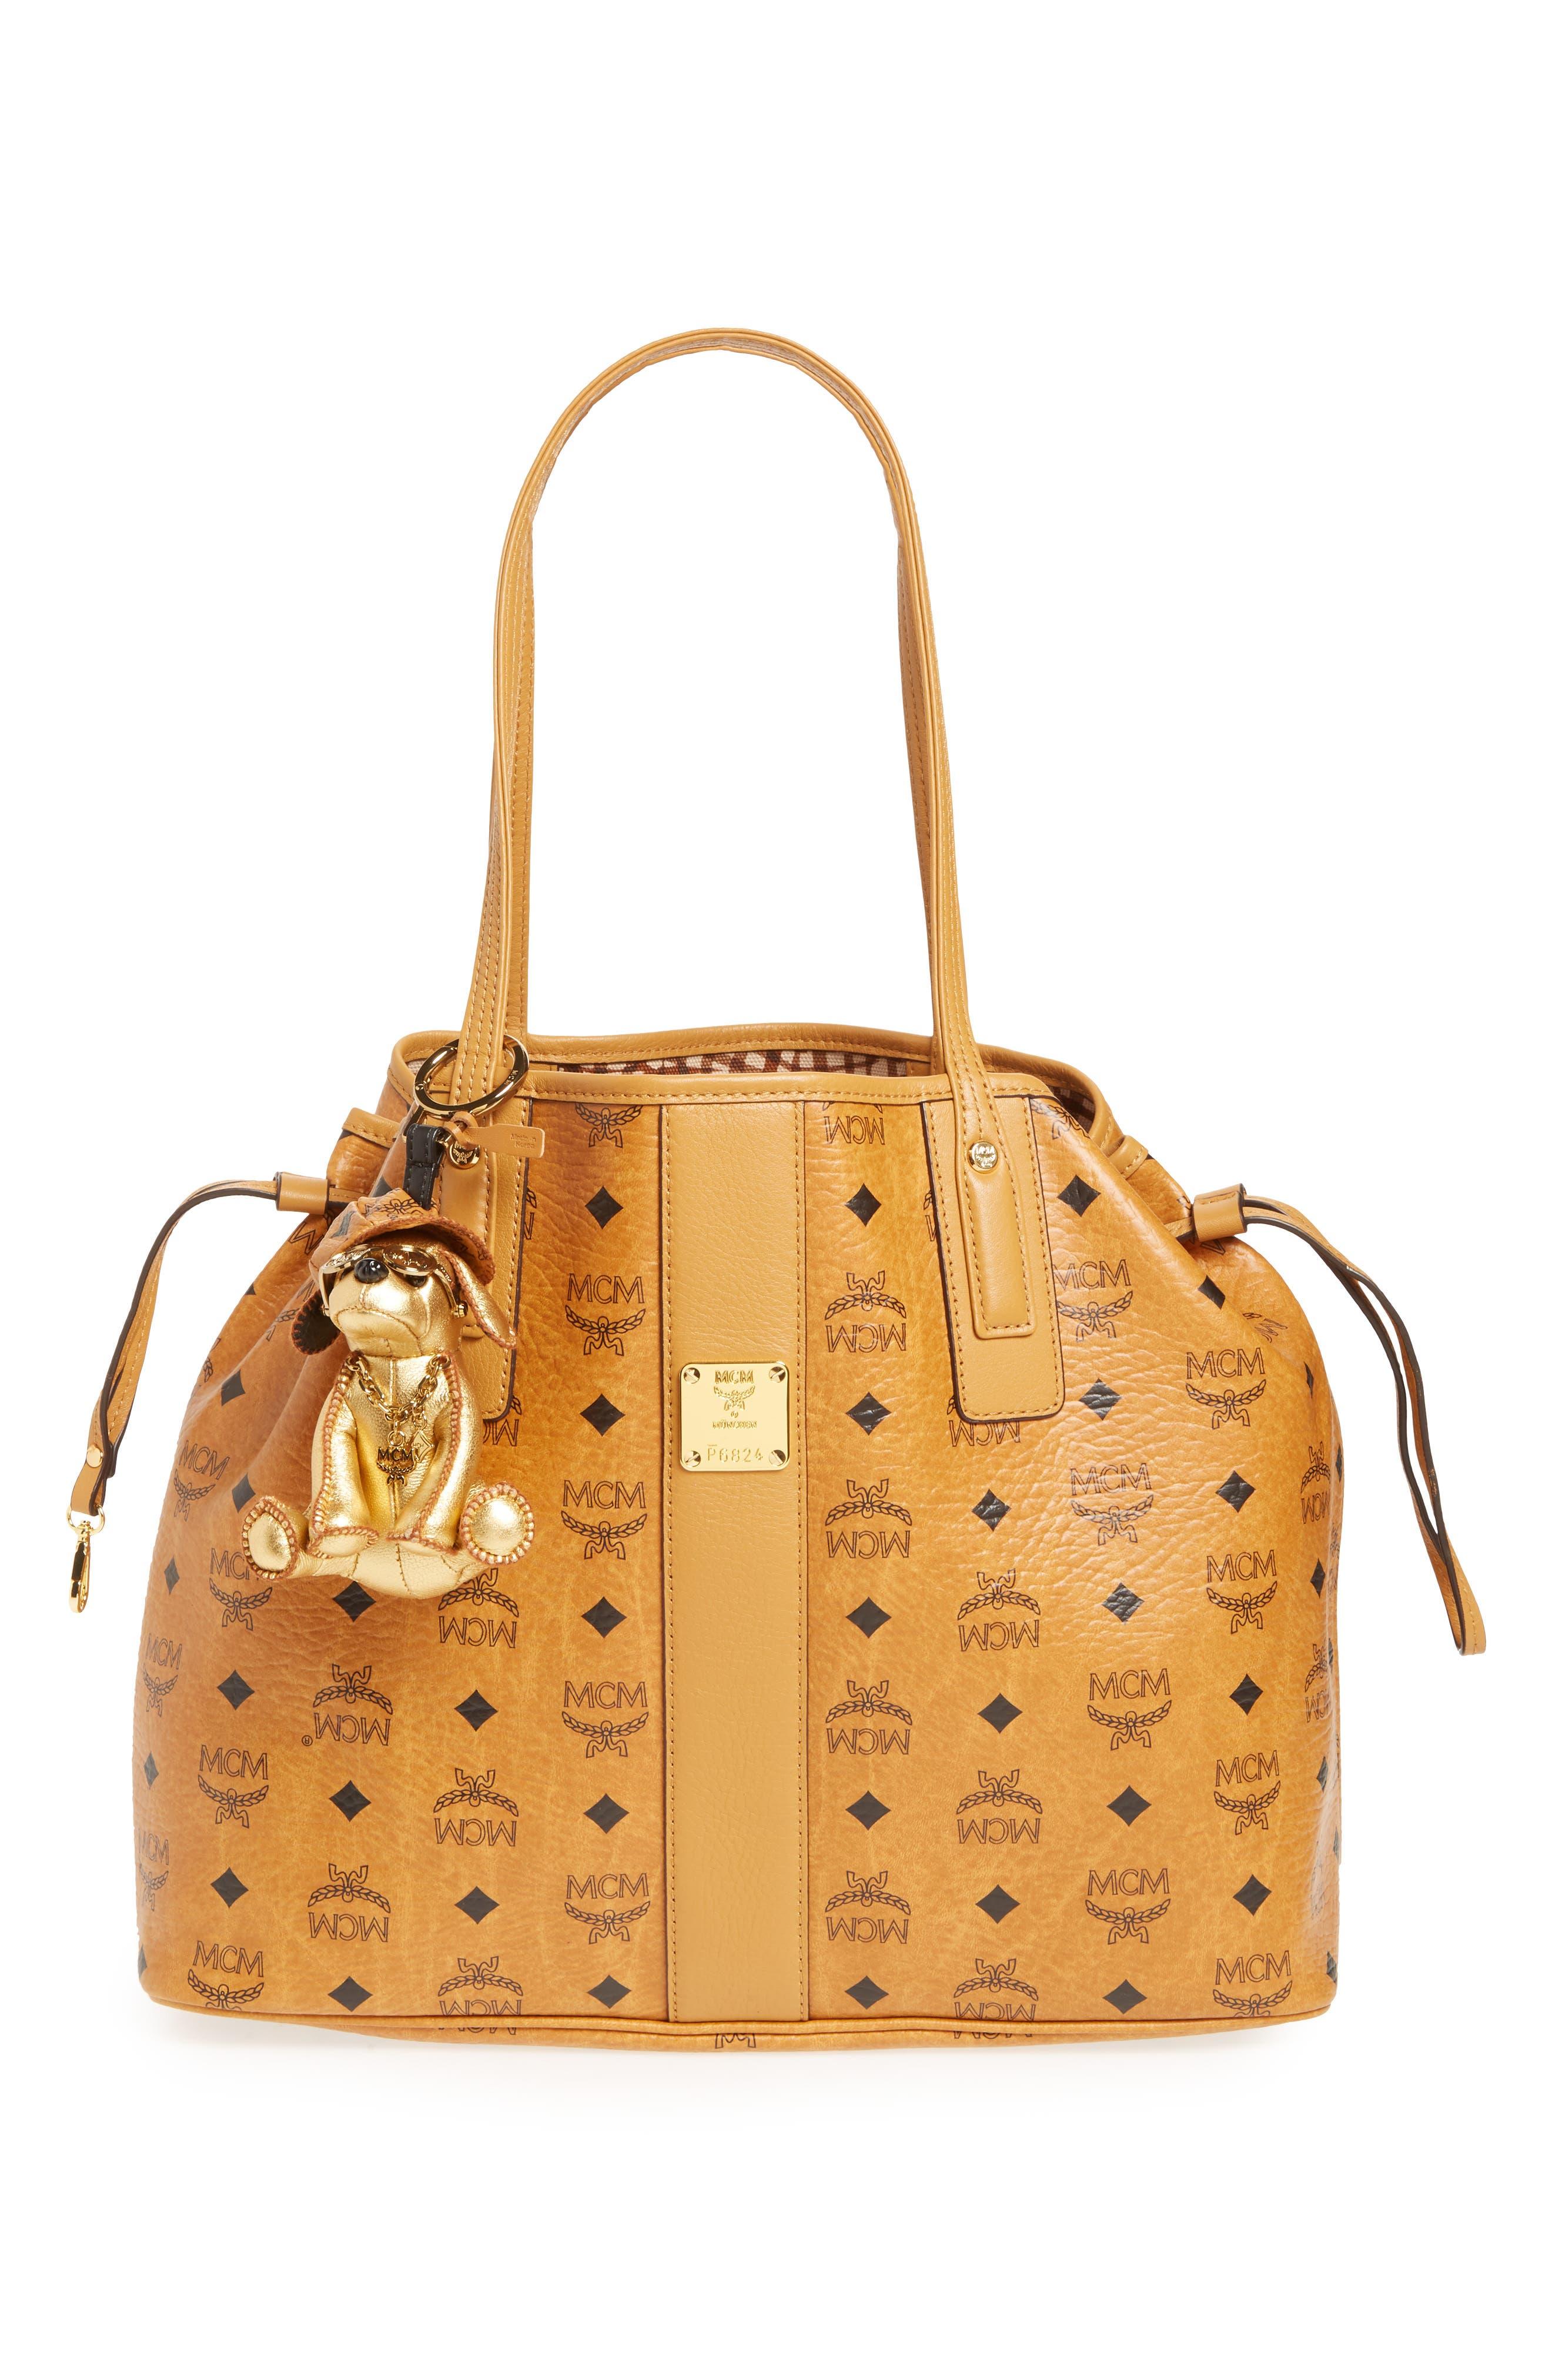 Dog Metallic Leather Bag Charm,                             Alternate thumbnail 2, color,                             Gold